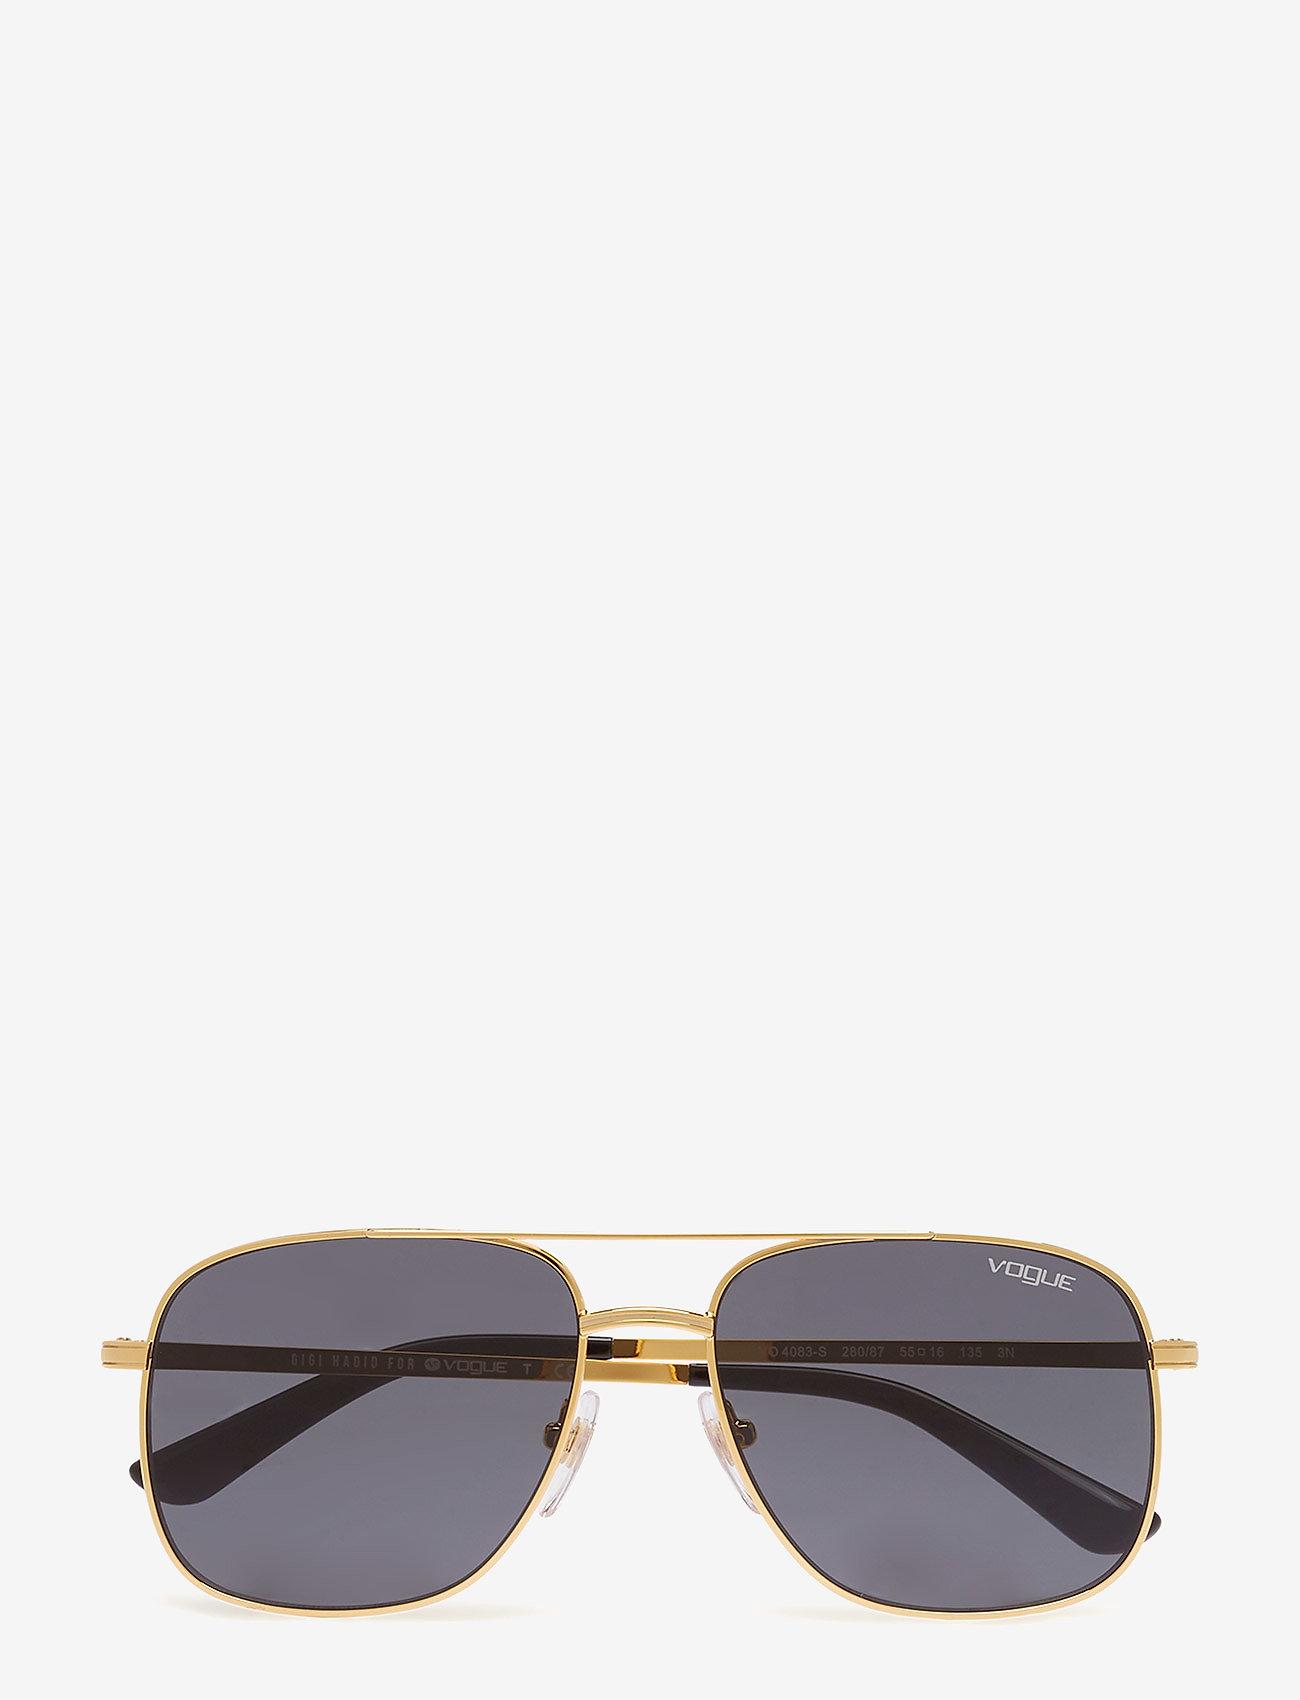 Vogue Eyewear - WOMEN'S SUNGLASSES - pilot - gold/grey - 0